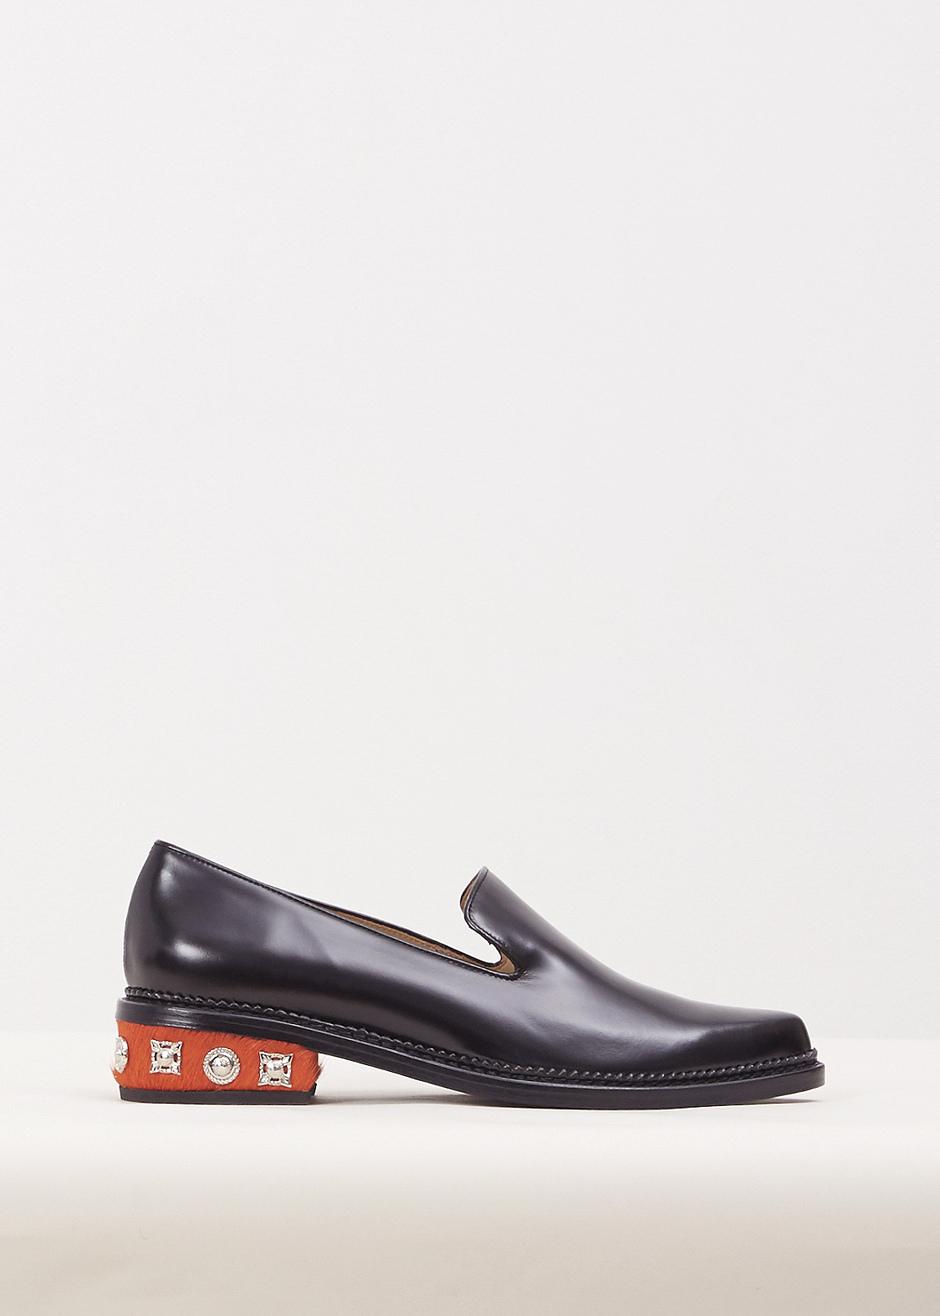 Toga Pulla Women's Embellished Loafers